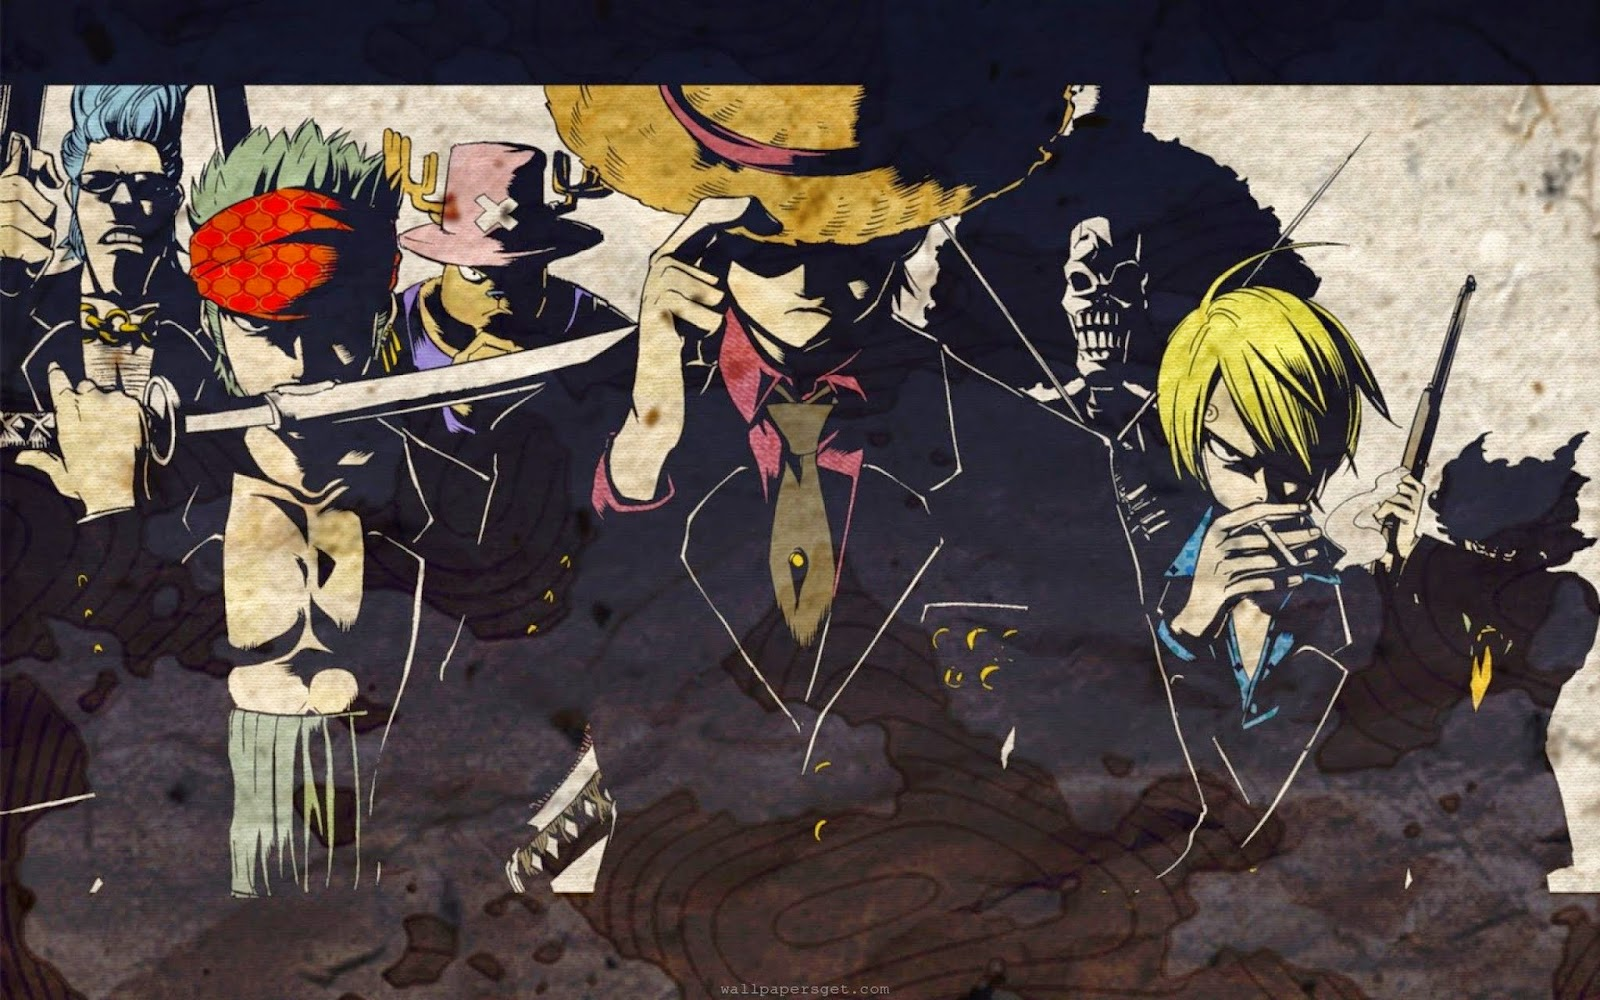 Wallpaper Hd Anime Free Wallpaper Onepiece Black Suit